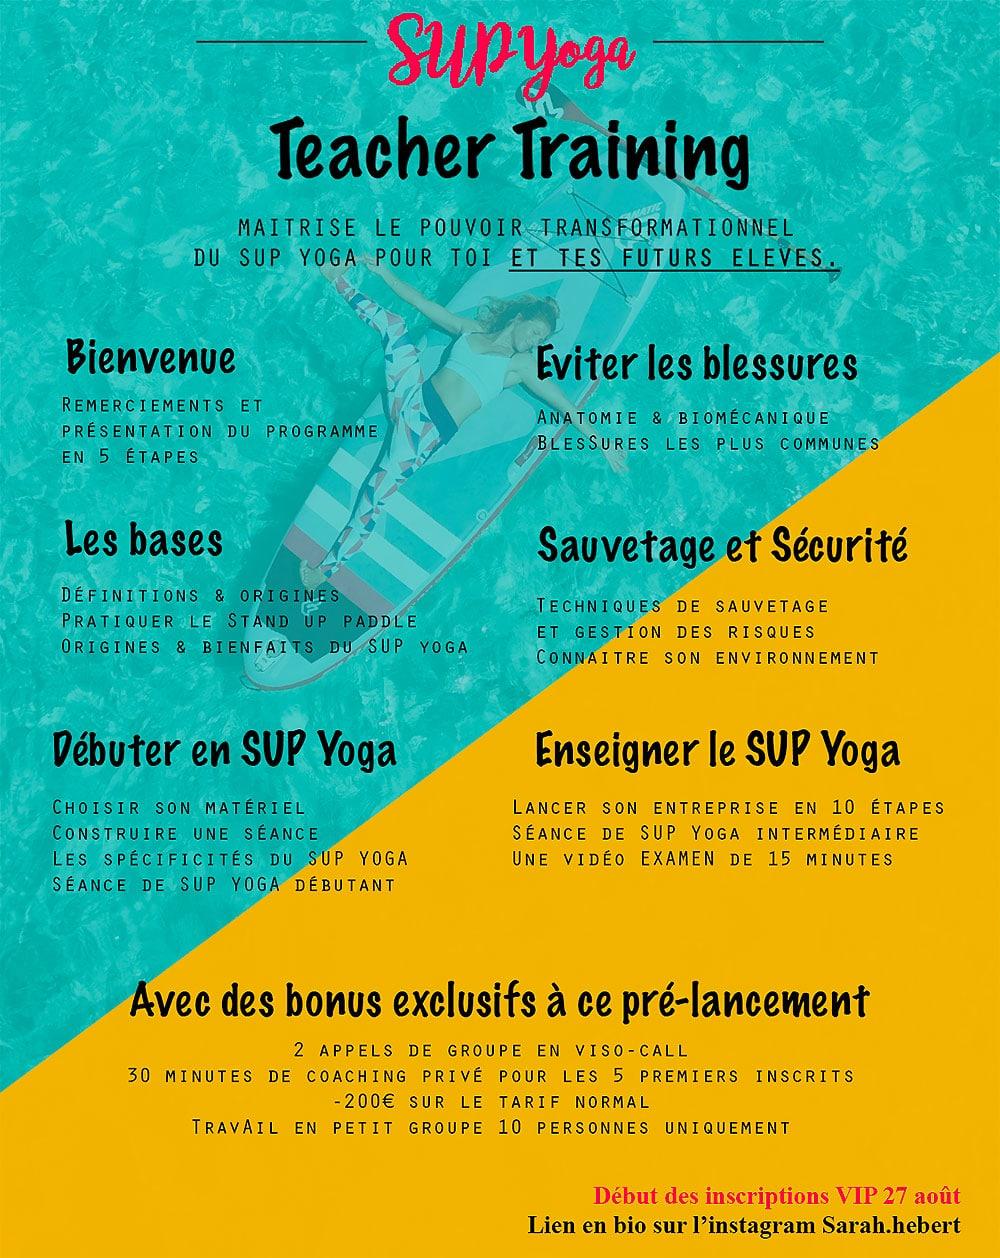 Sup Yoga teacher training online